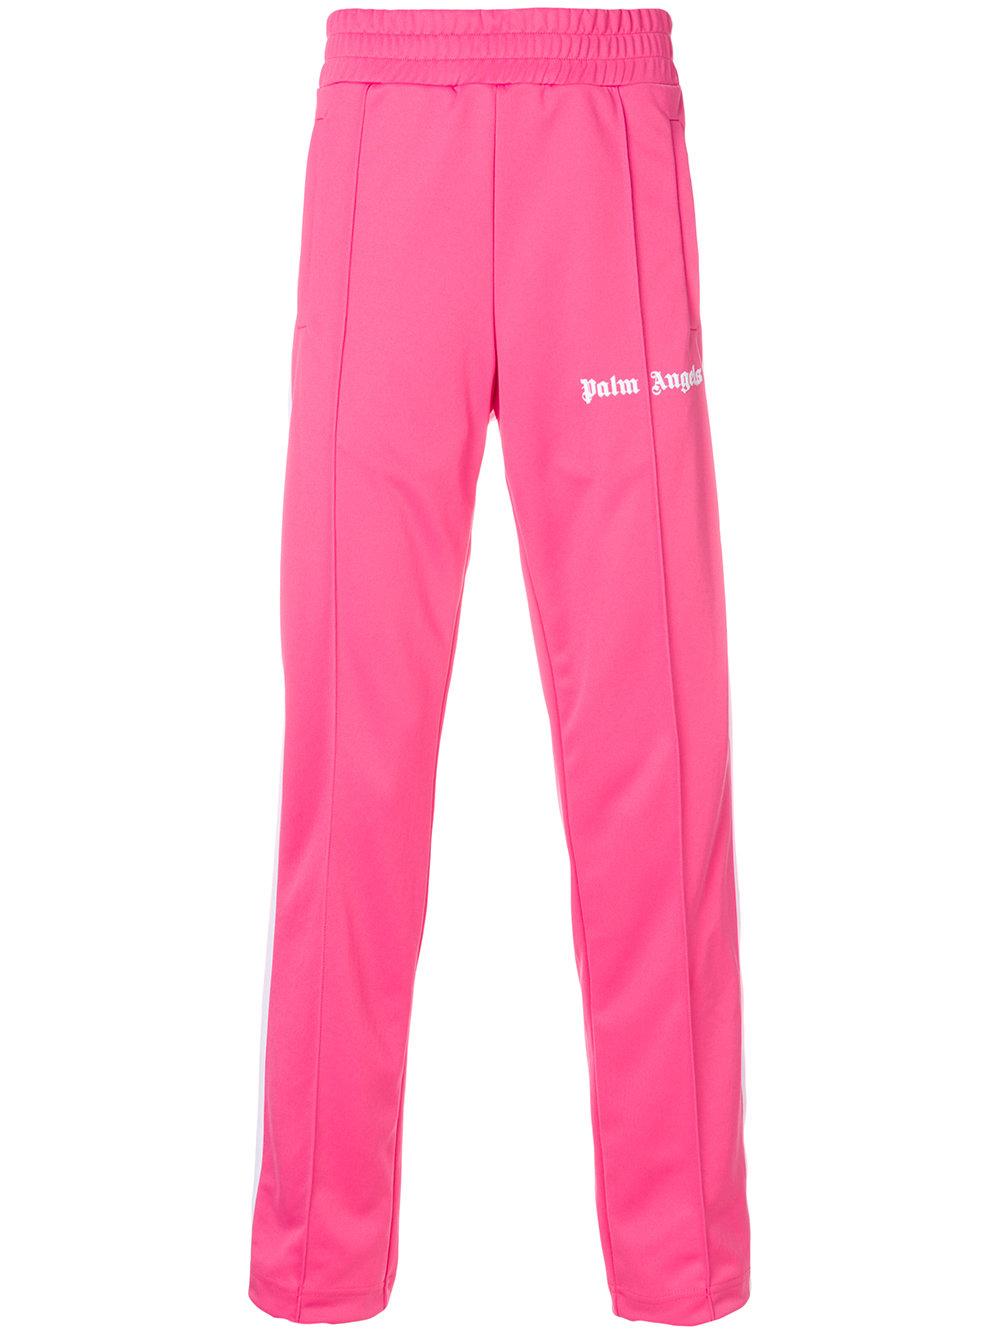 Palm Angels Track Pants $352,  Farfetch.com